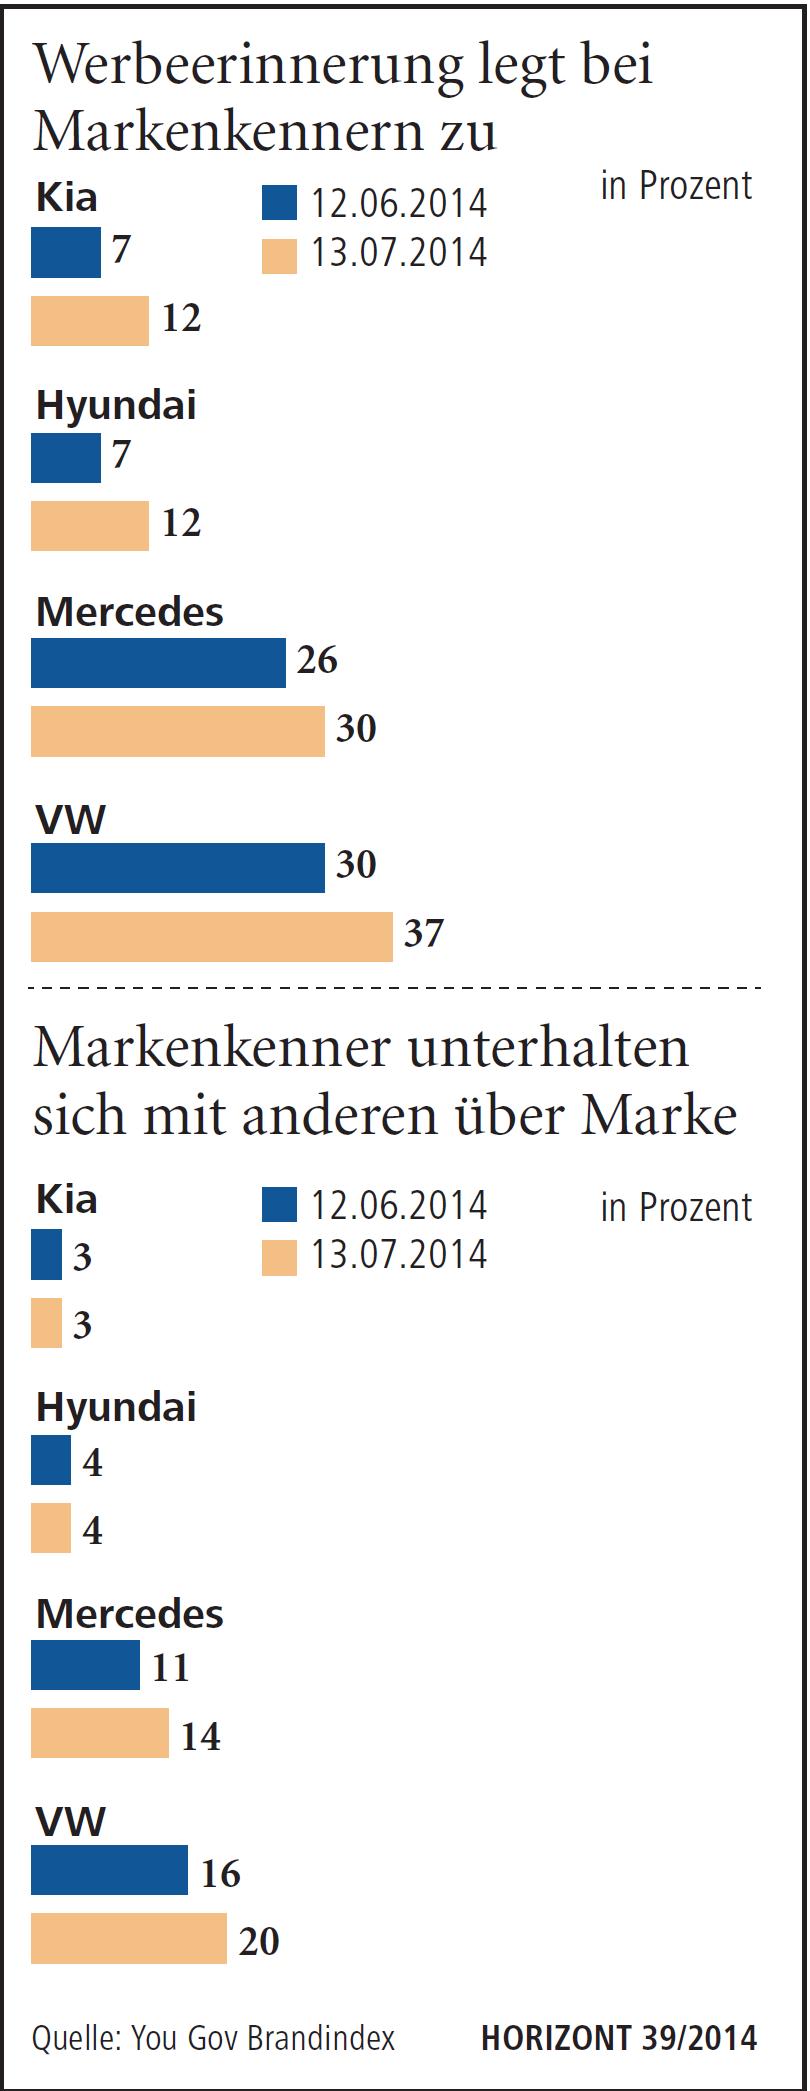 Fantastisch Arbeitsblatt Bilanz Galerie - Mathe Arbeitsblatt ...